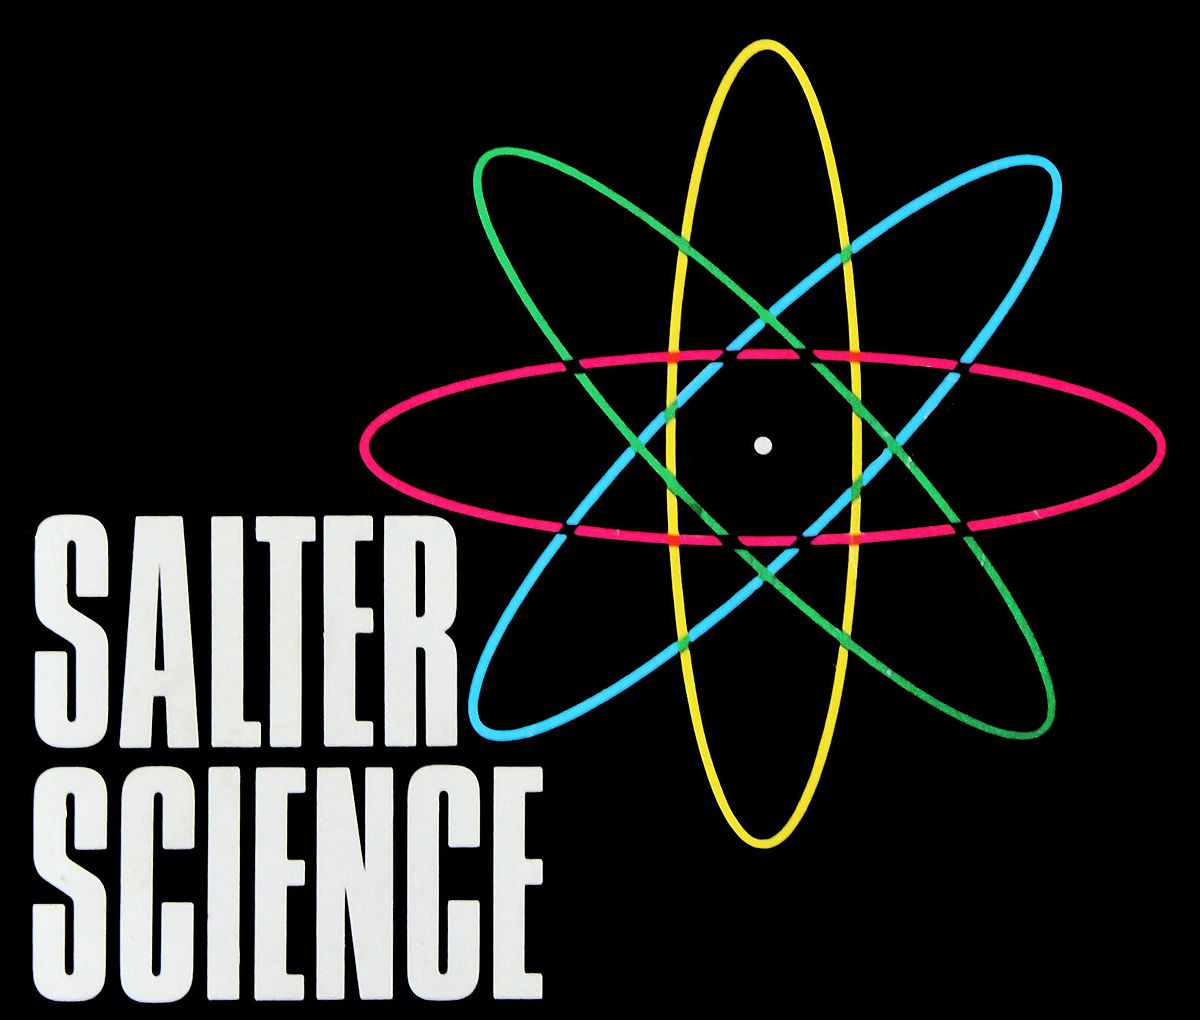 Salter Science